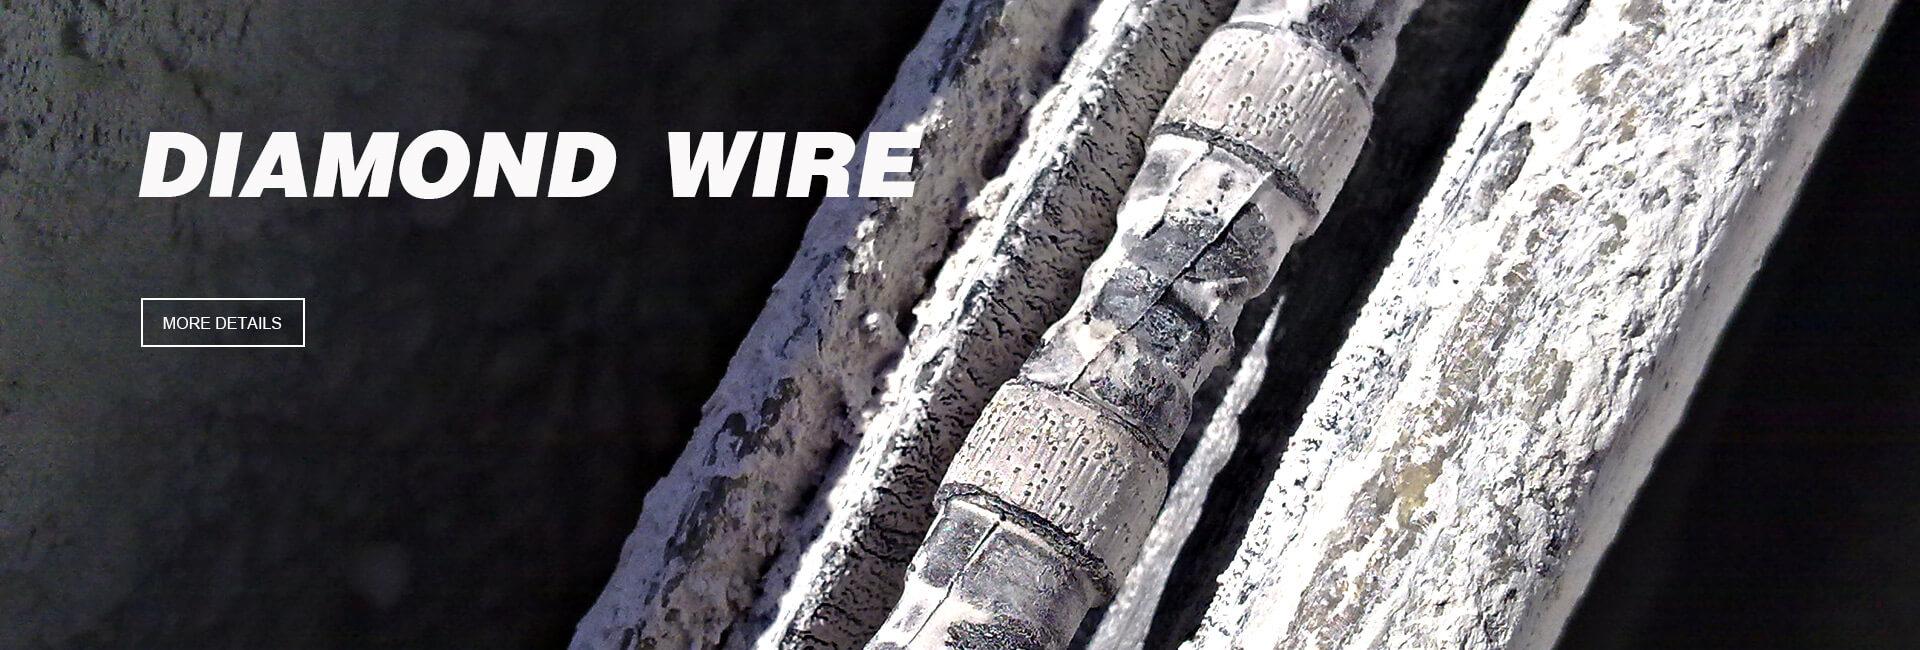 China diamond cutting wire,diamond wire saw manufacturers and ...